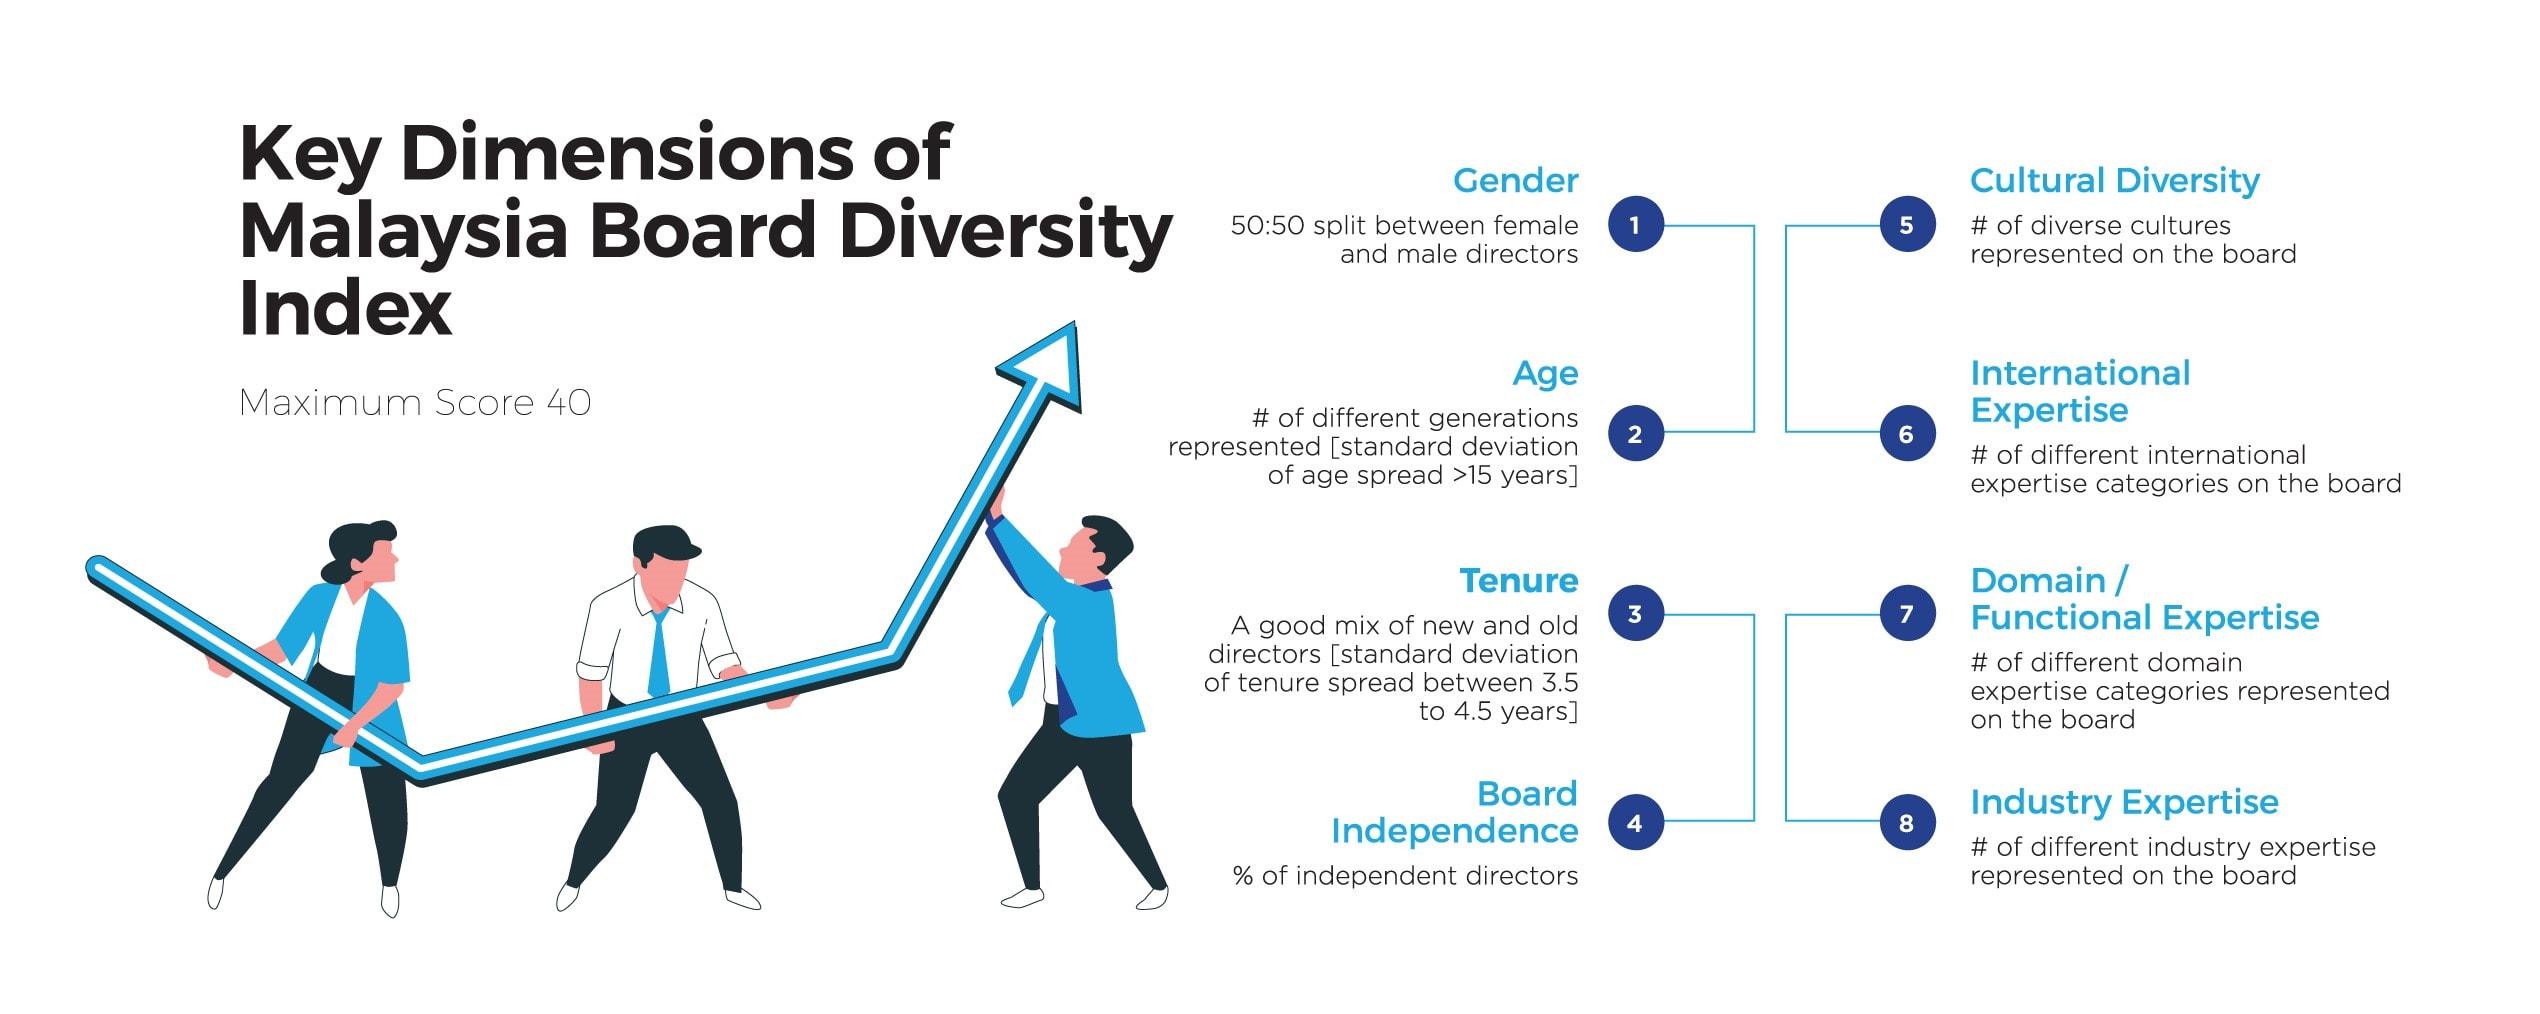 8 key dimensions